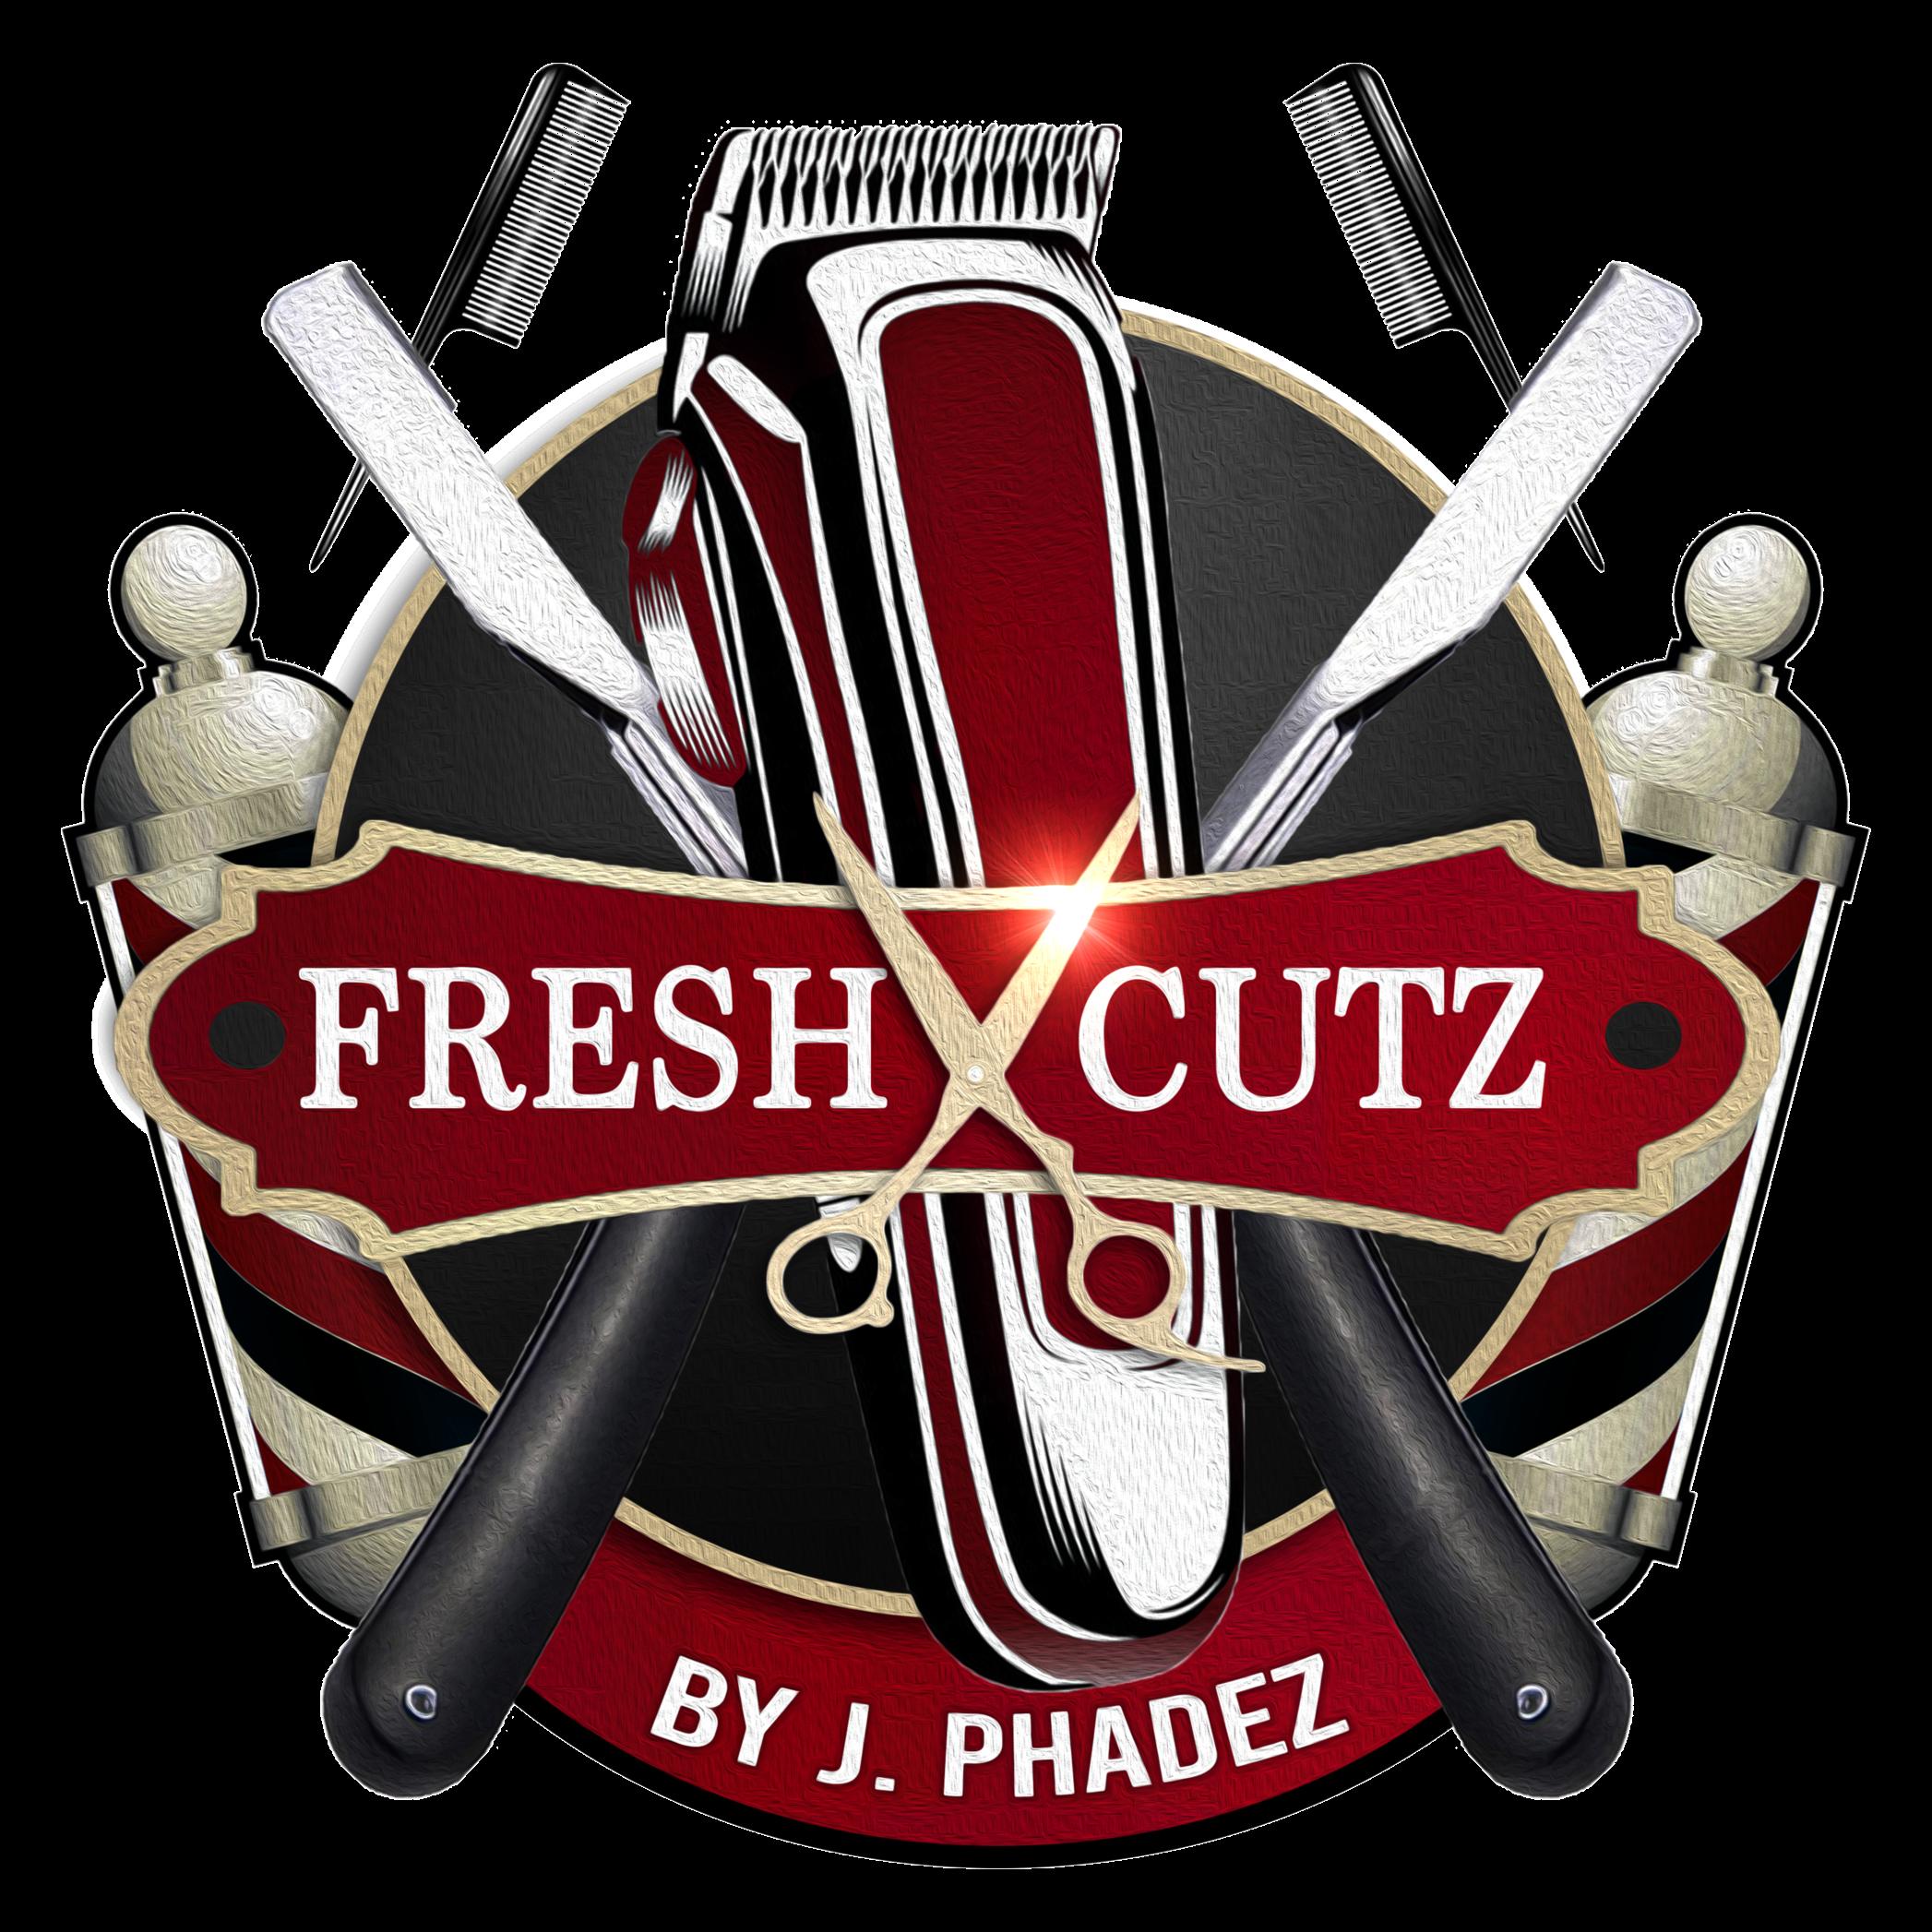 Fresh Cutz by J. Phadez